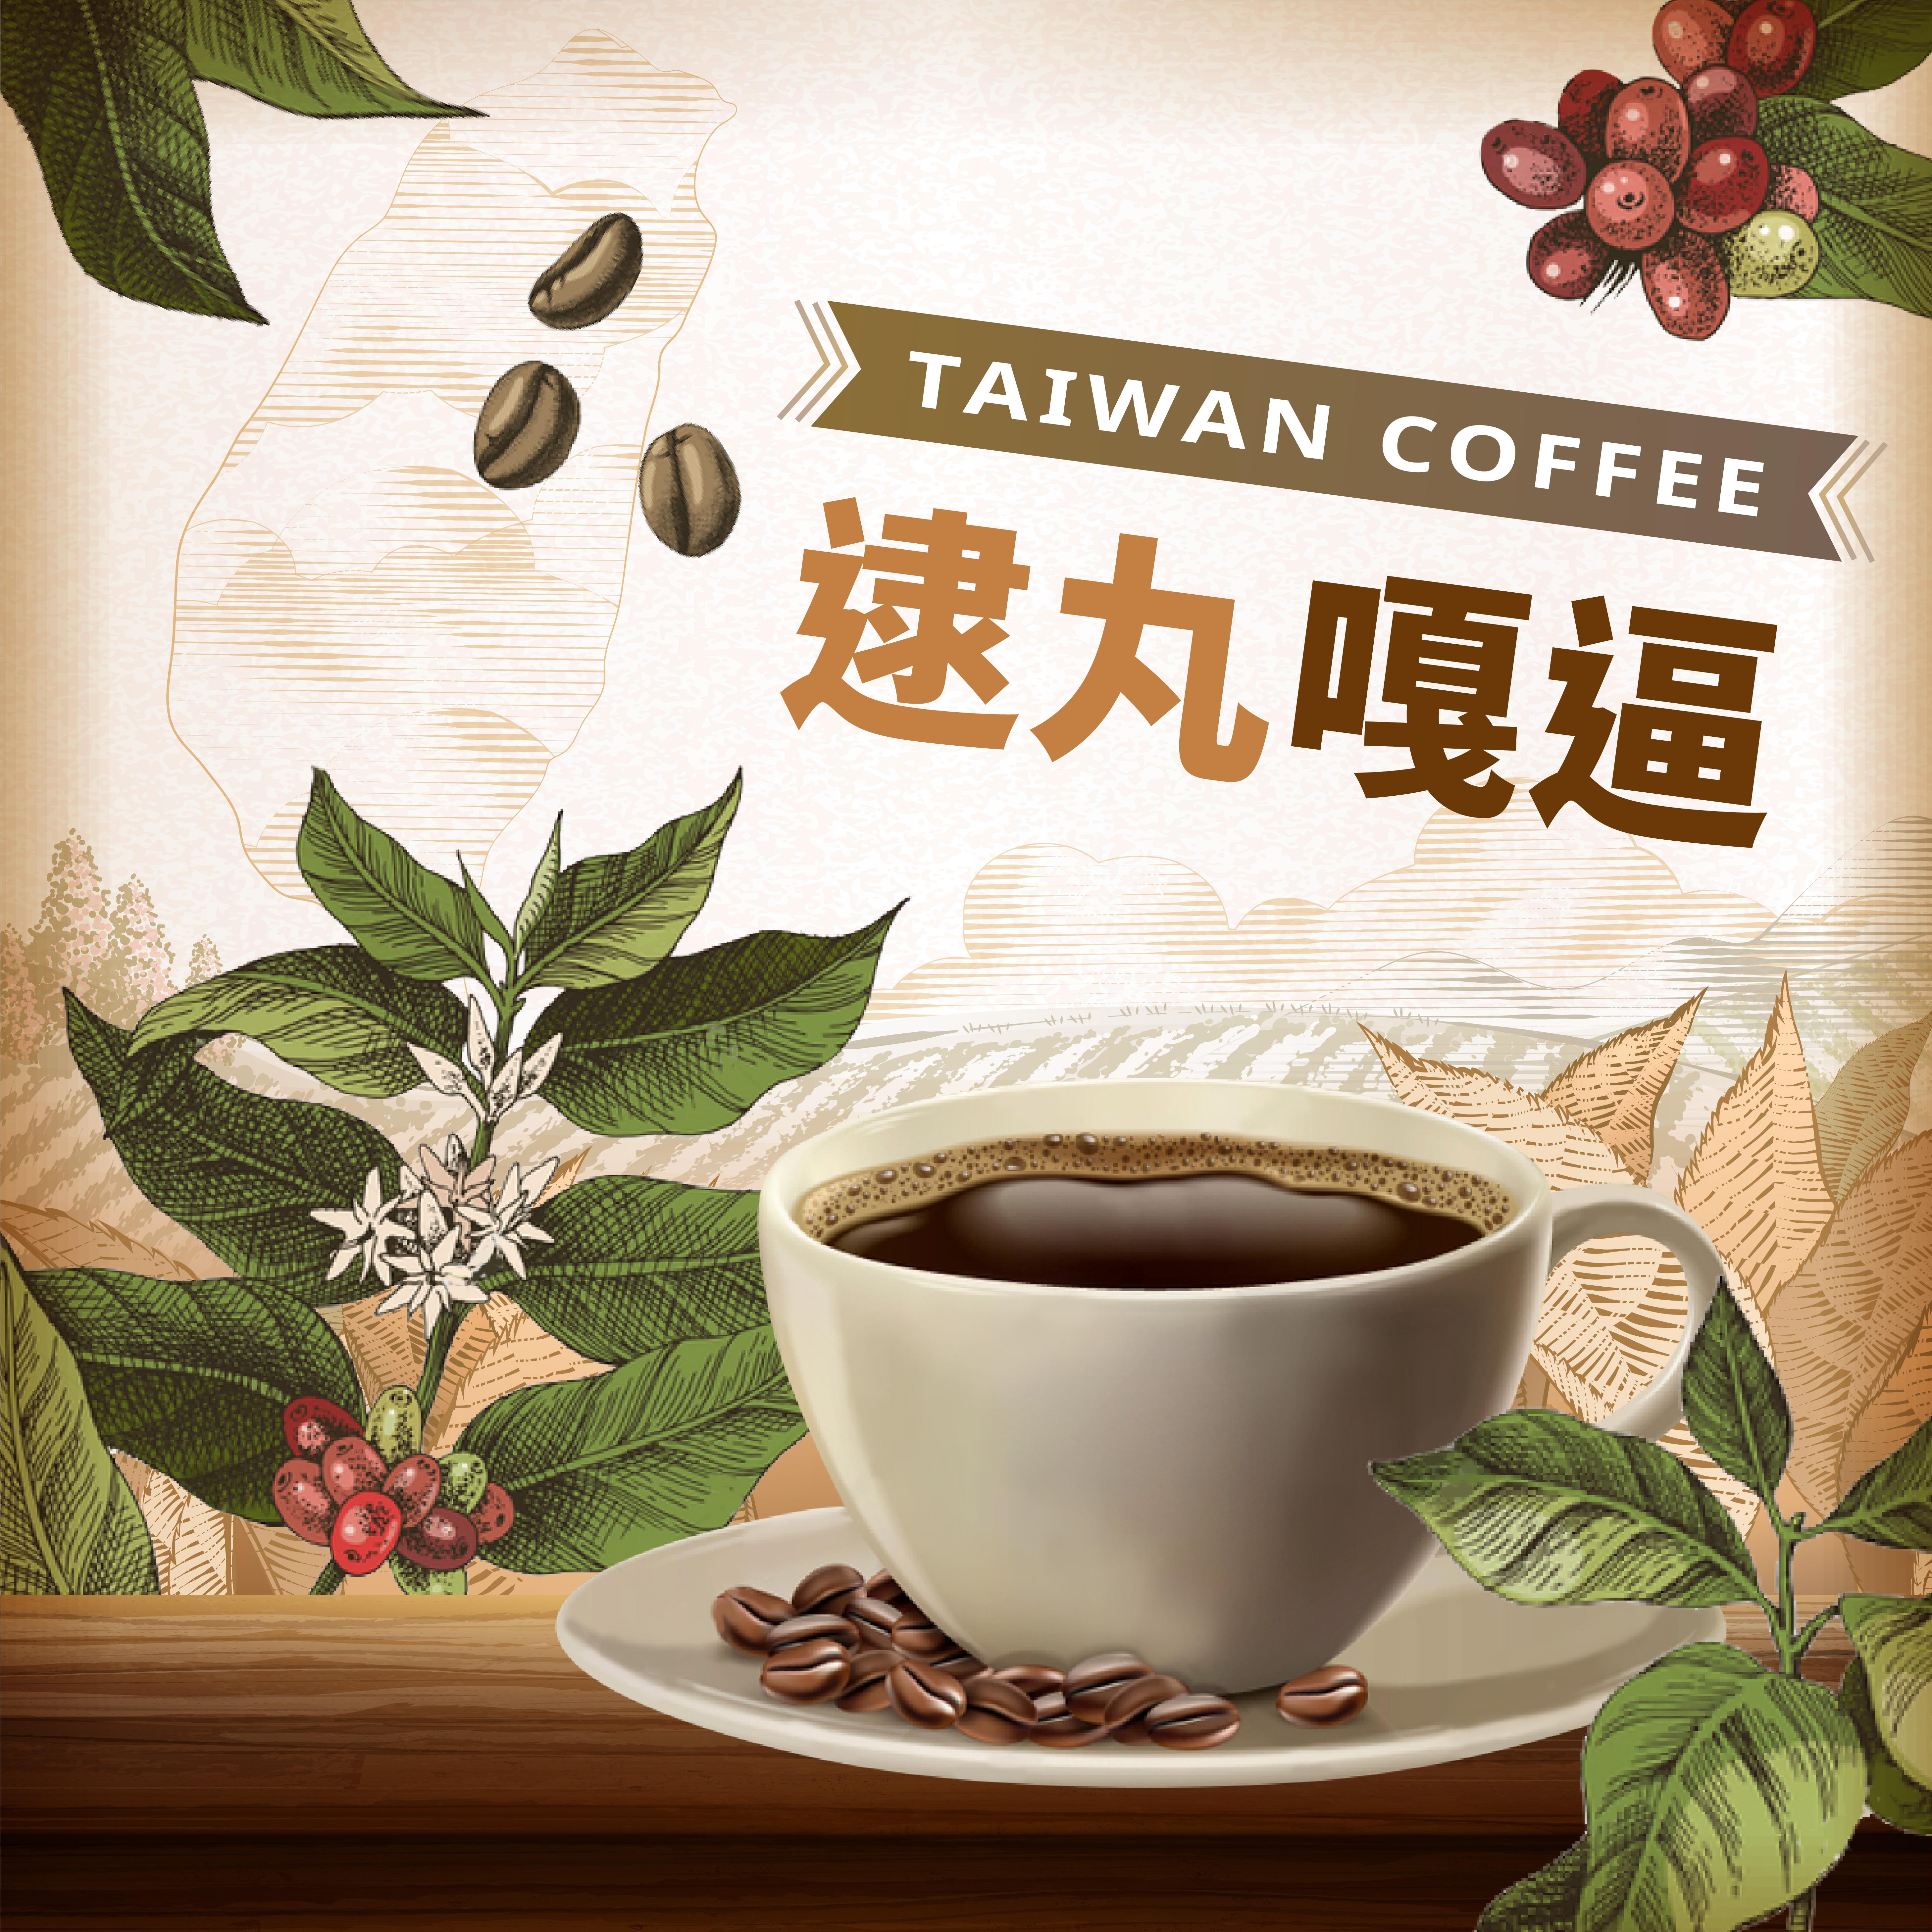 EP 10【封面故事】逮丸嘎逼 Taiwan Coffee